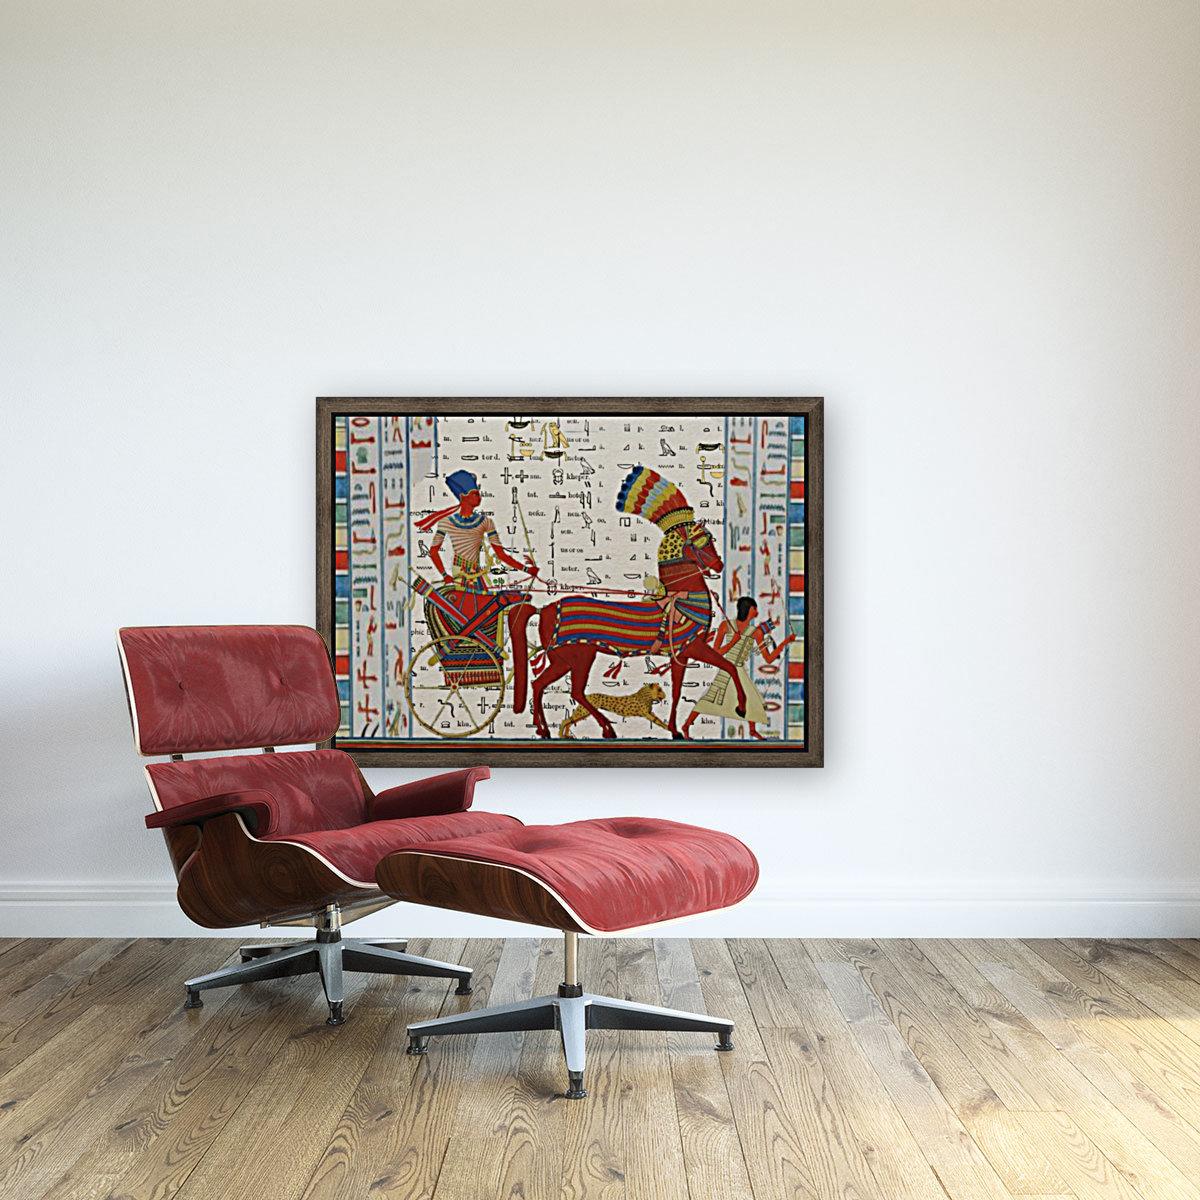 egyptian tutunkhamun pharaoh design   Art